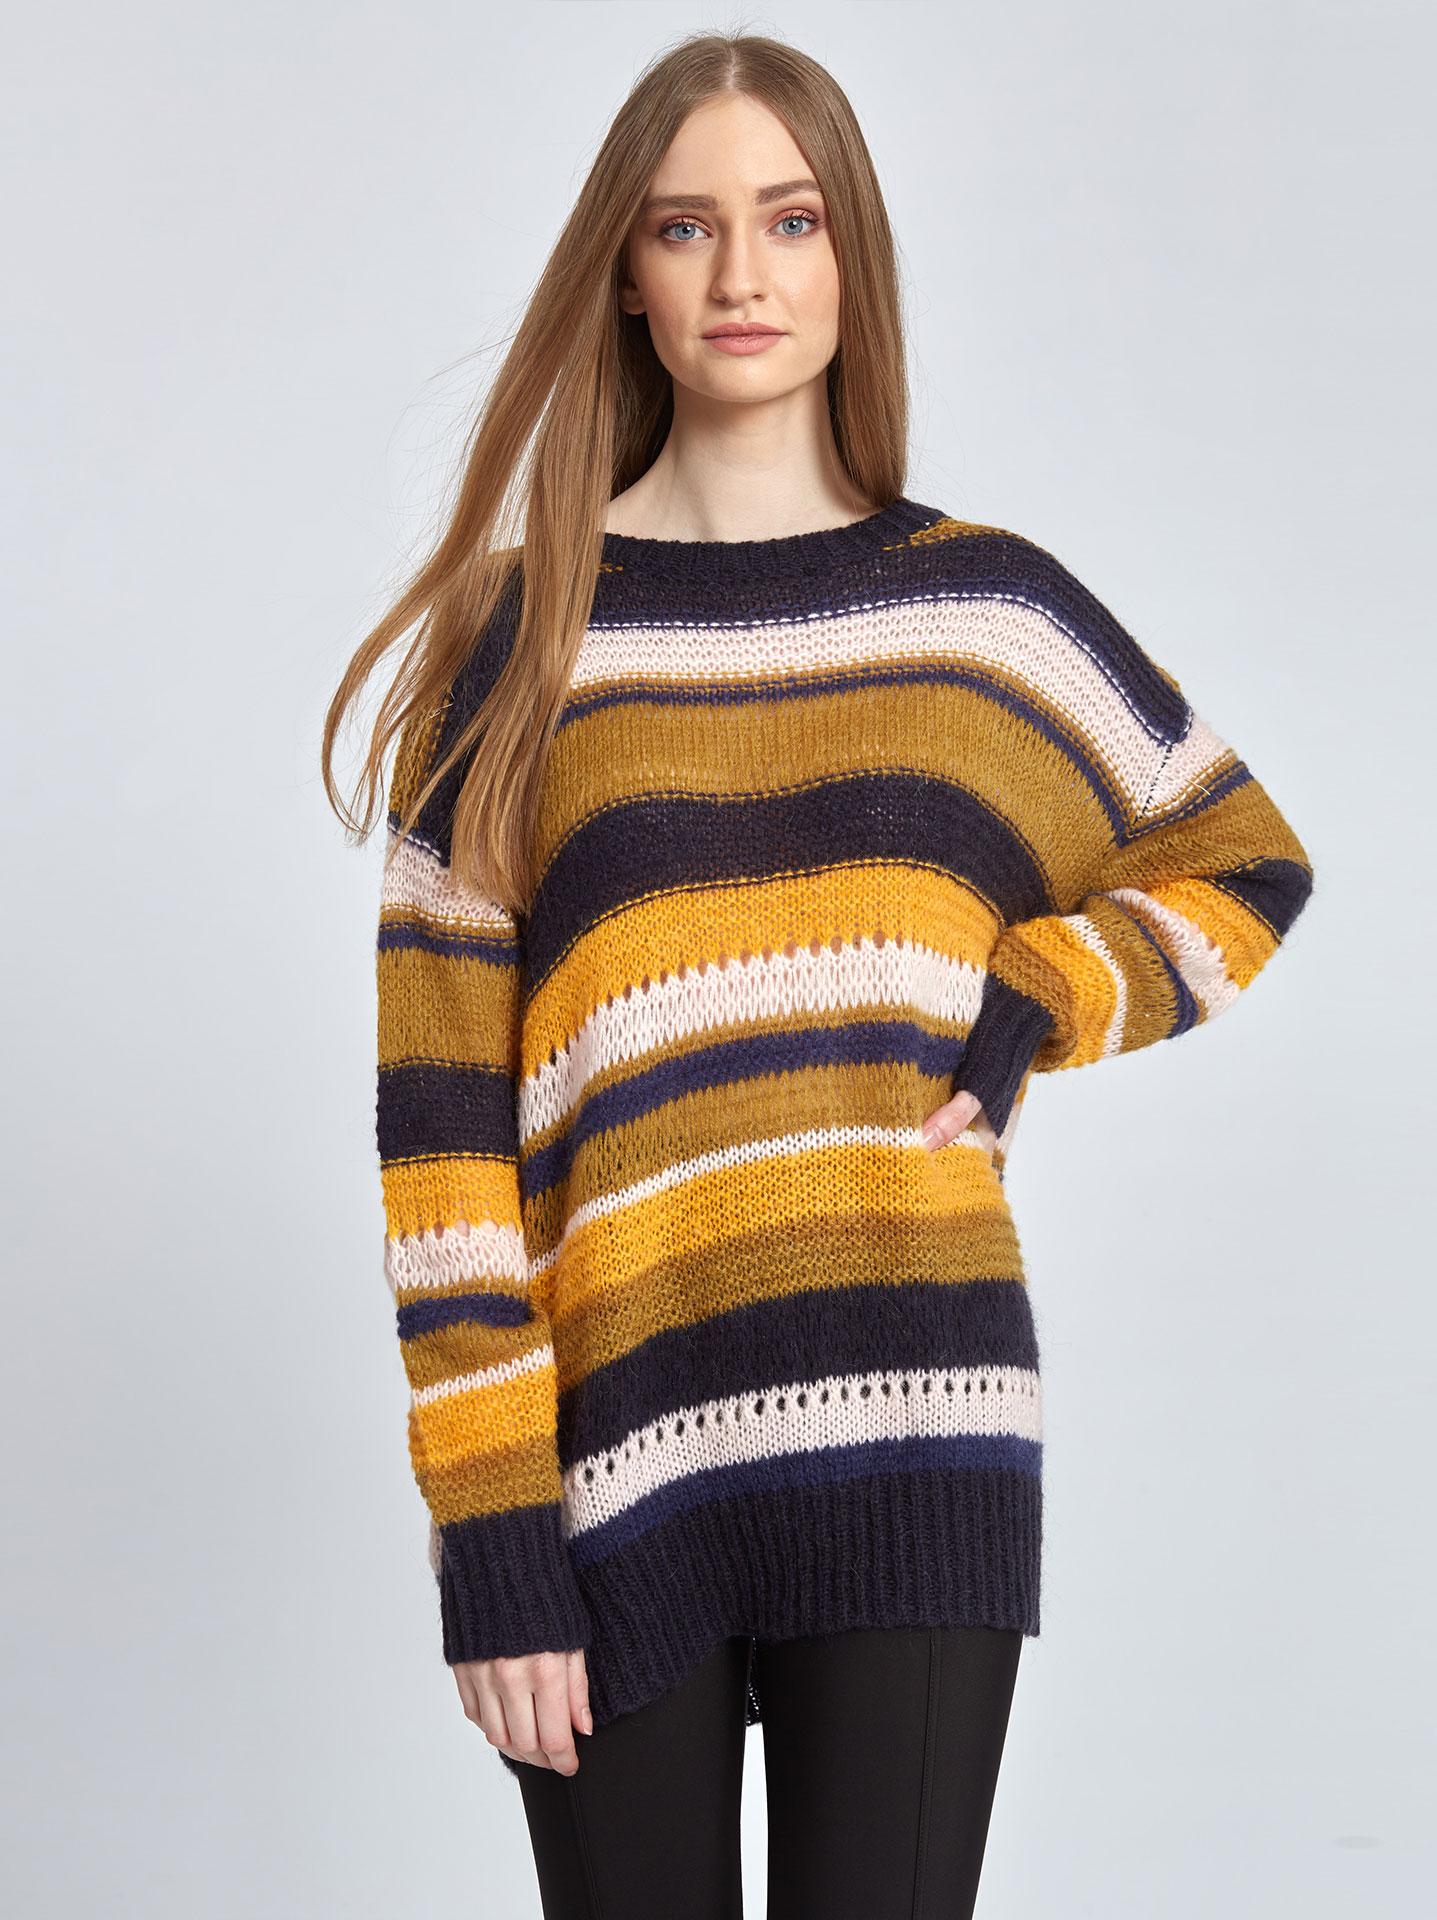 1bc9a0c69617 Ριγέ πλεκτό πουλόβερ σε κιτρινο